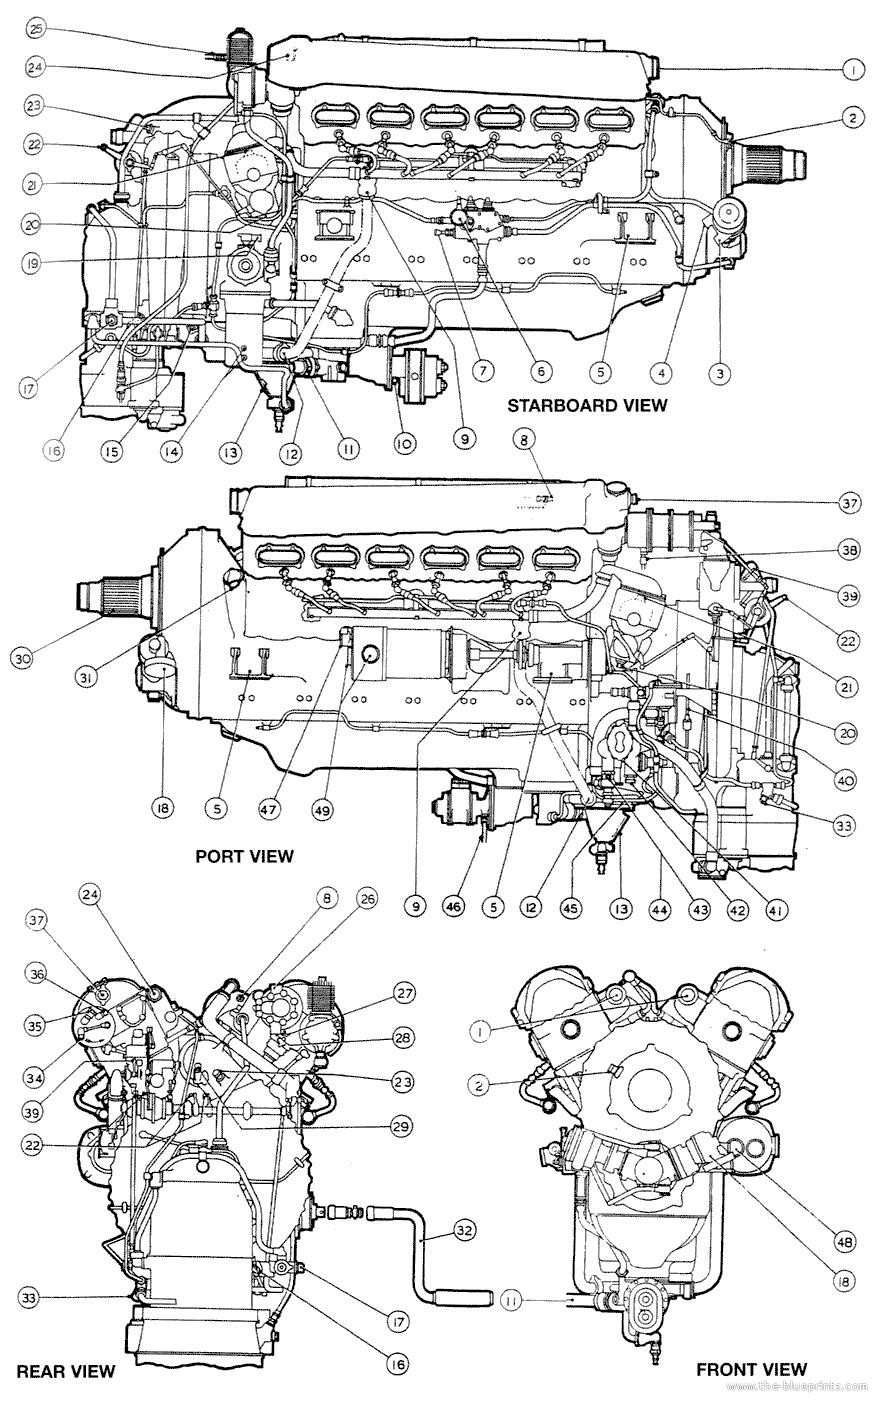 image result for www offenhauser engine drawings spitfire rh pinterest com Allison V-1710 www Rolls-Royce Merlin Engines